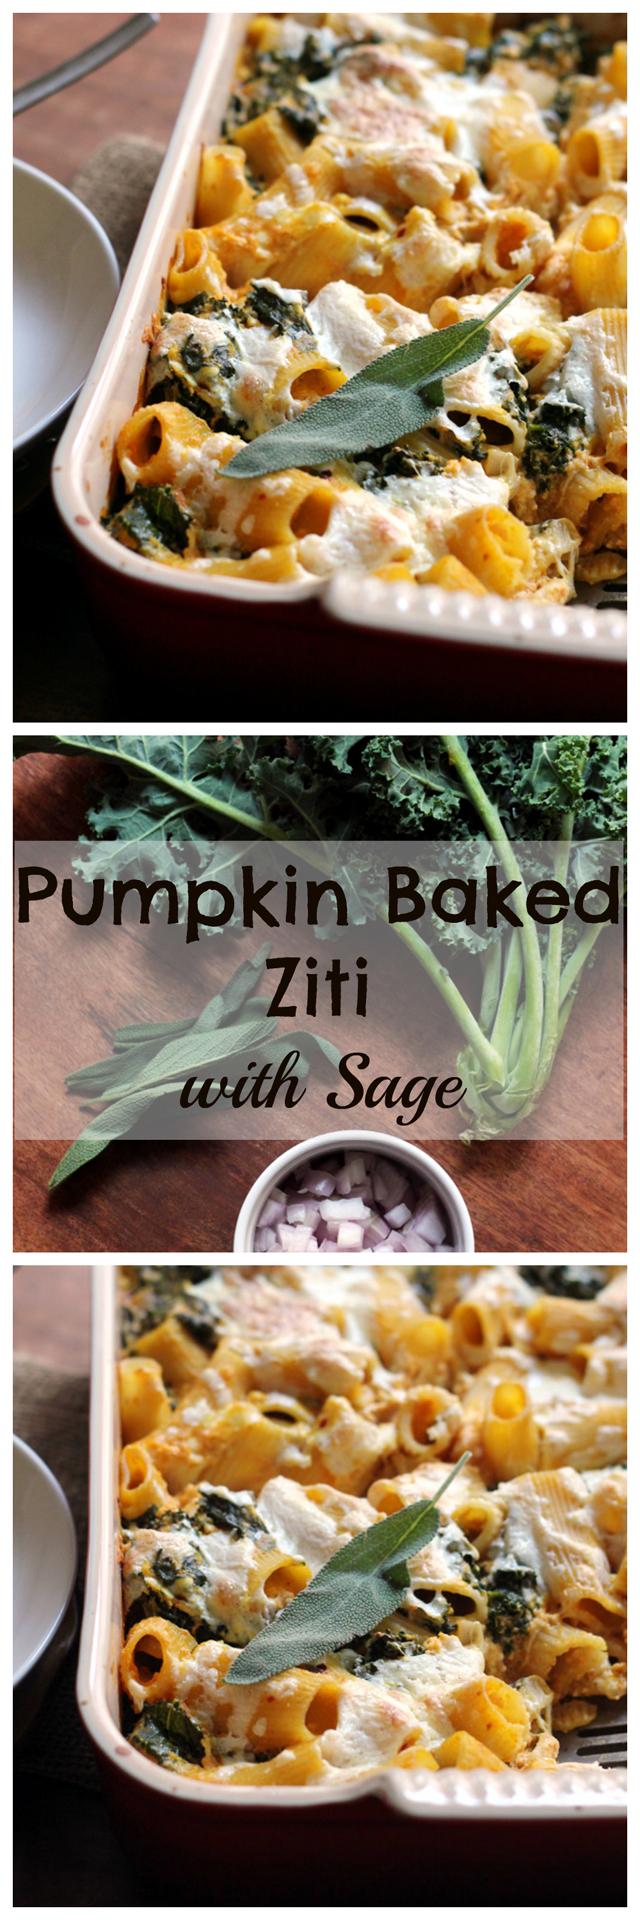 pumpkin baked ziti with sage